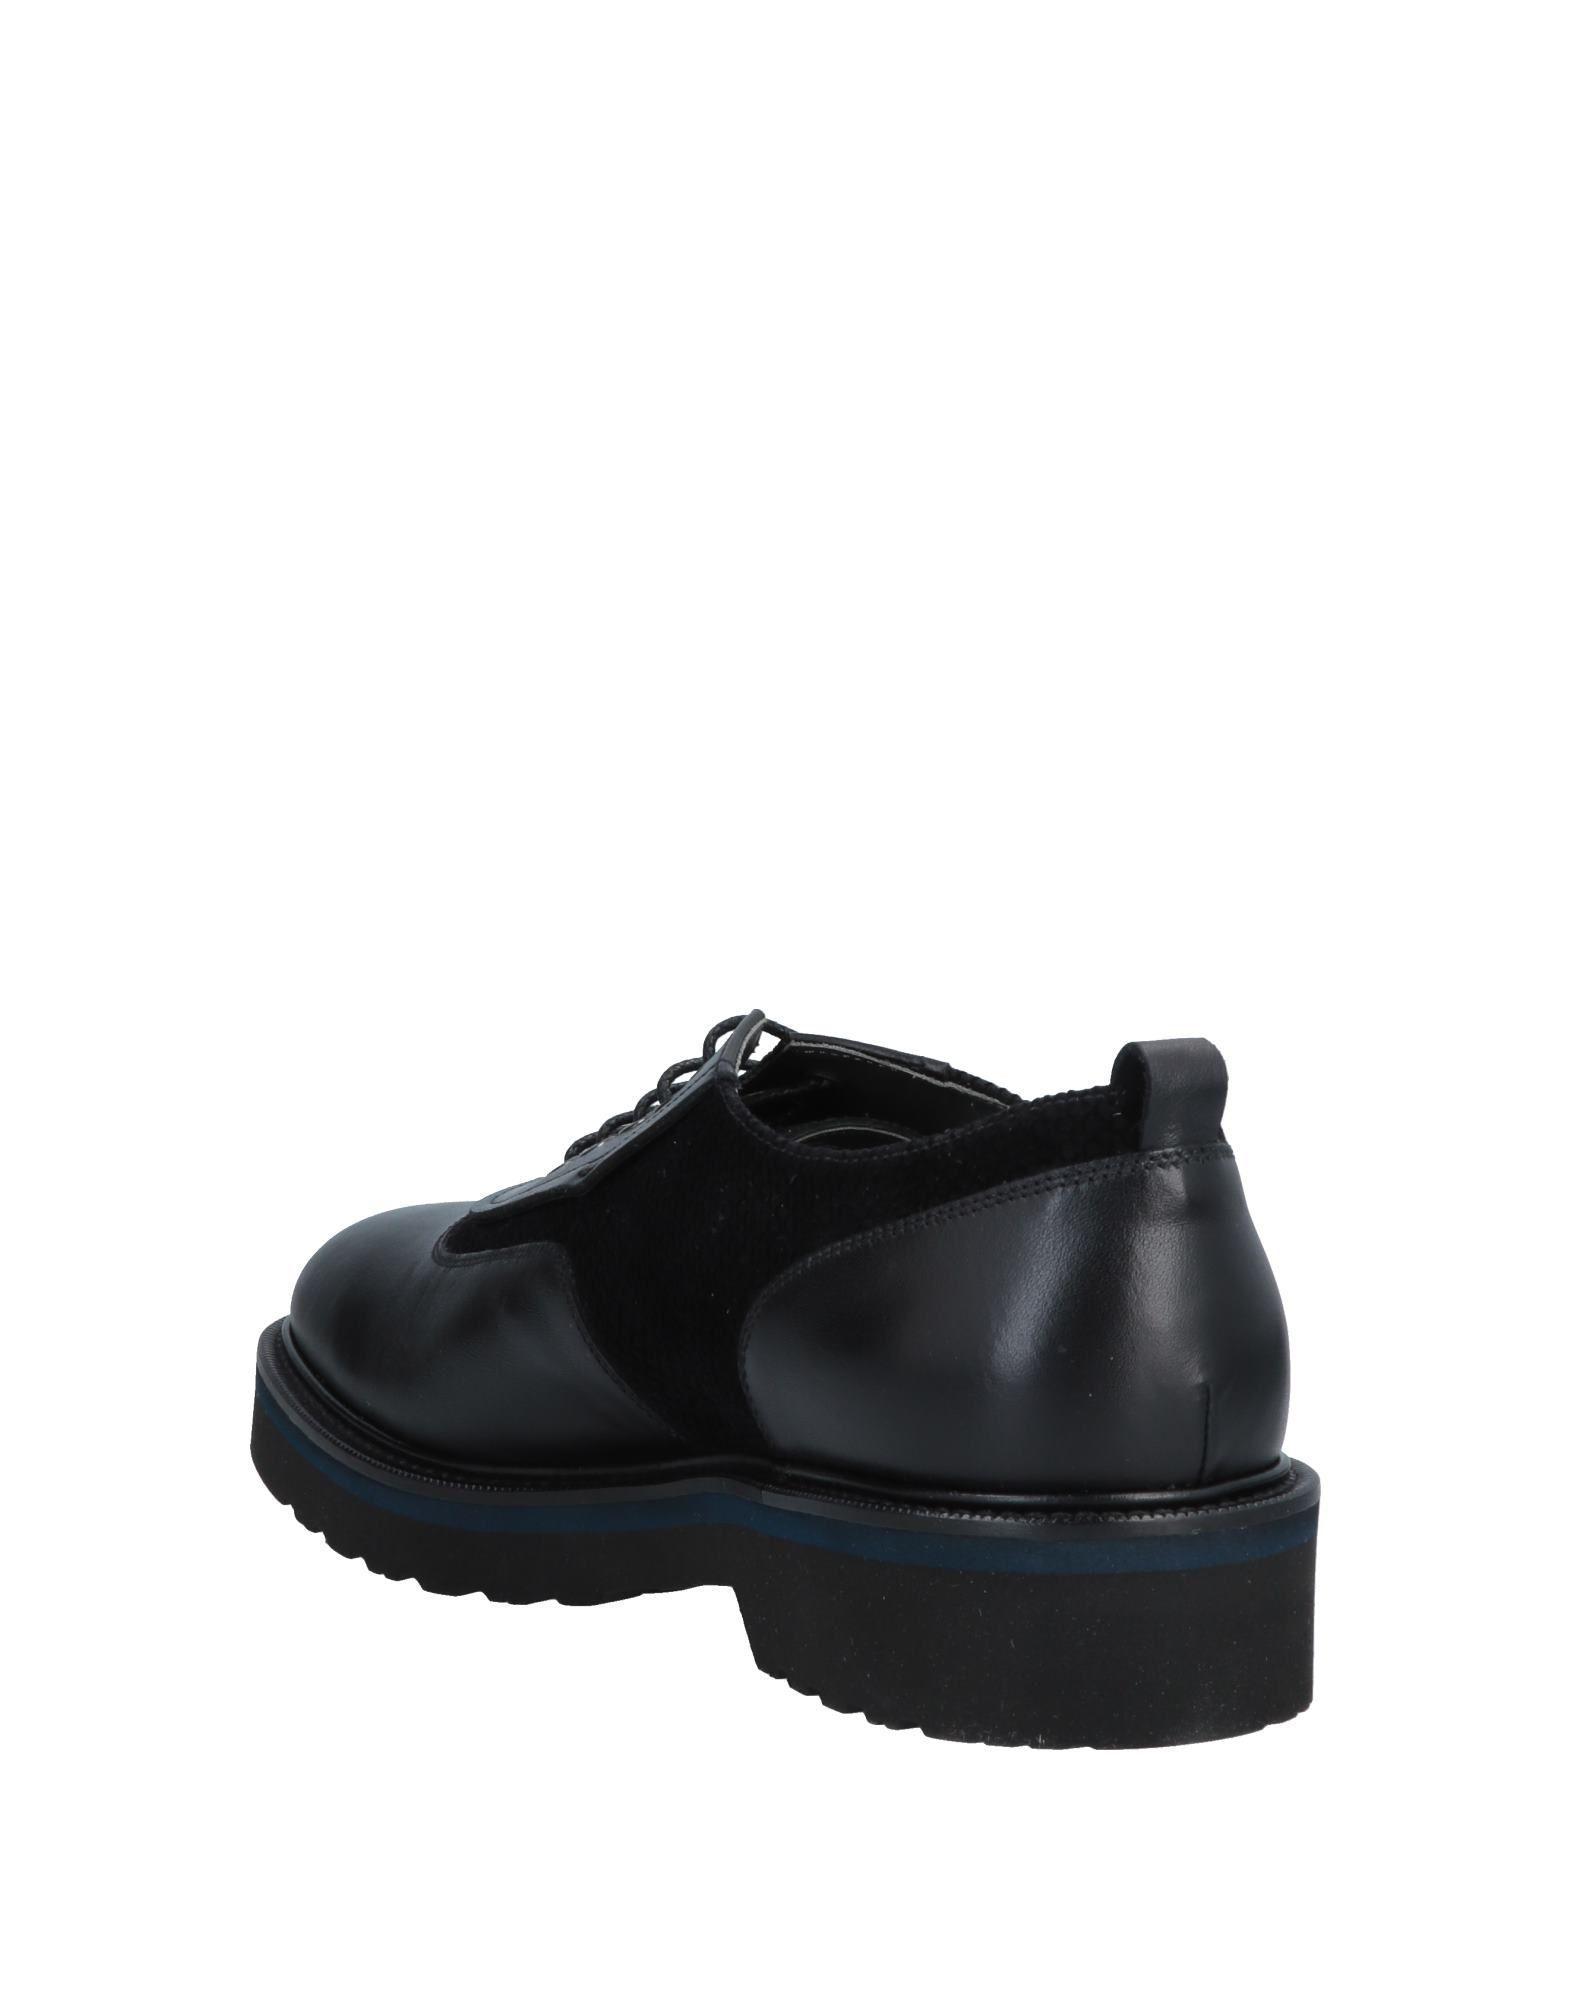 eda277083e36 Lyst - Alberto Guardiani Lace-up Shoe in Black for Men